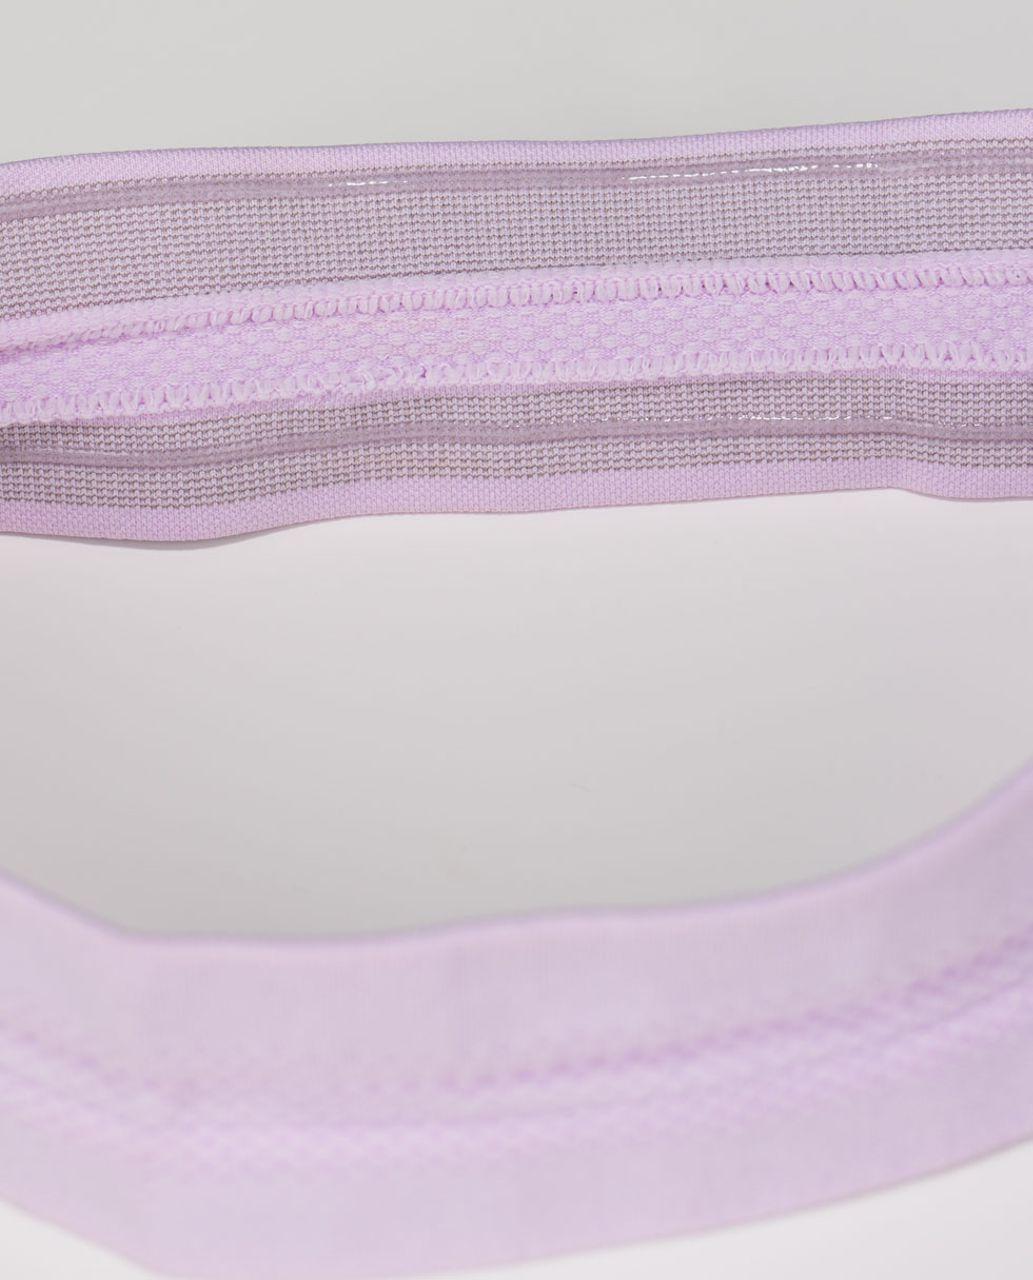 Lululemon Swiftly Headband - Heathered Pretty Purple